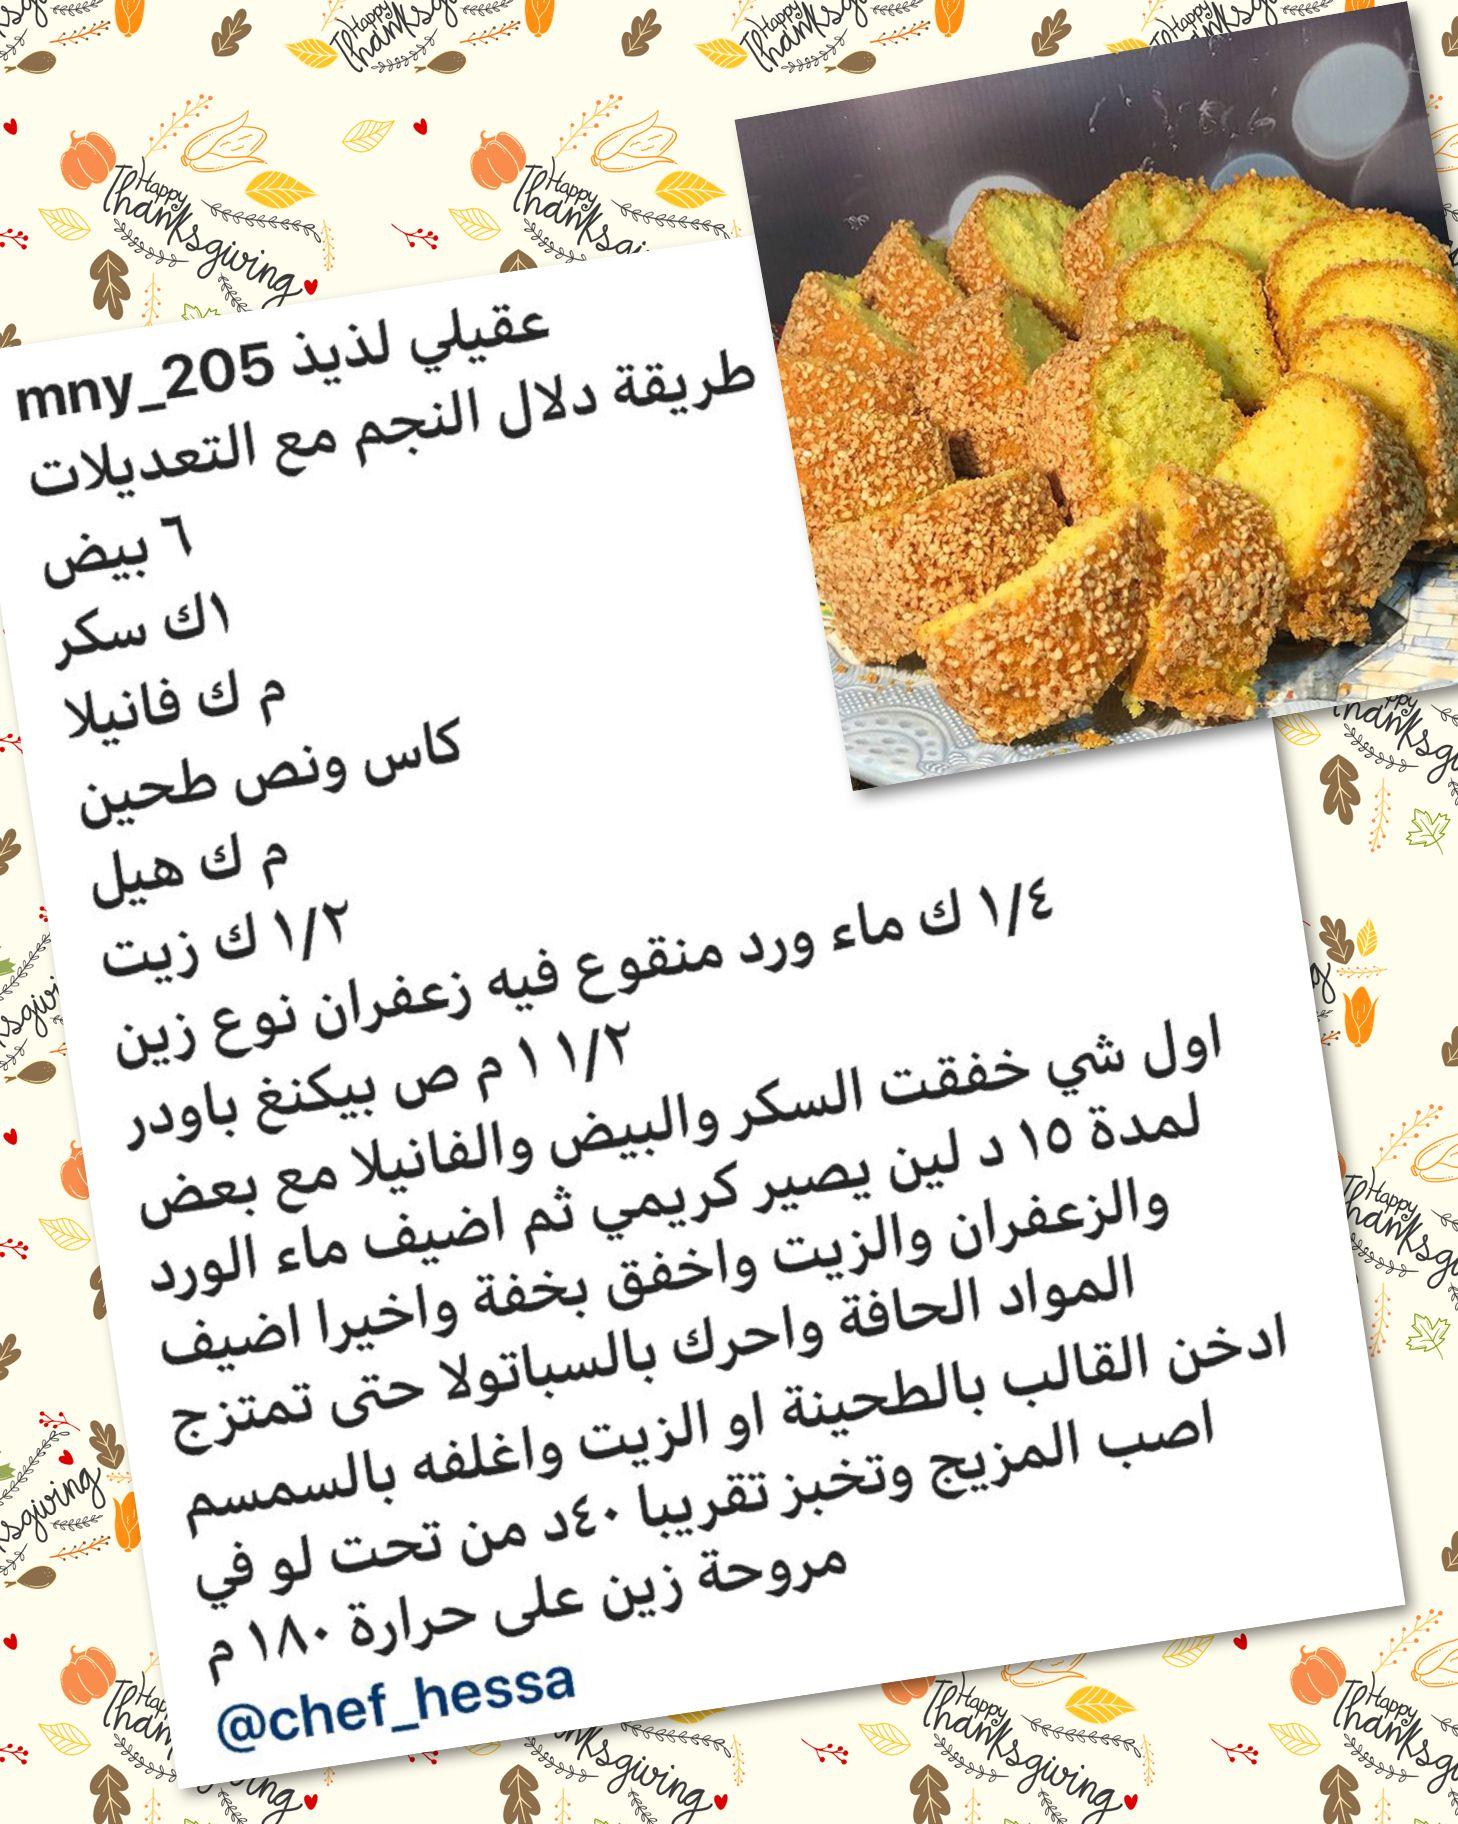 كيكة قرص عقيلي Food Receipes Arabian Food Arabic Food